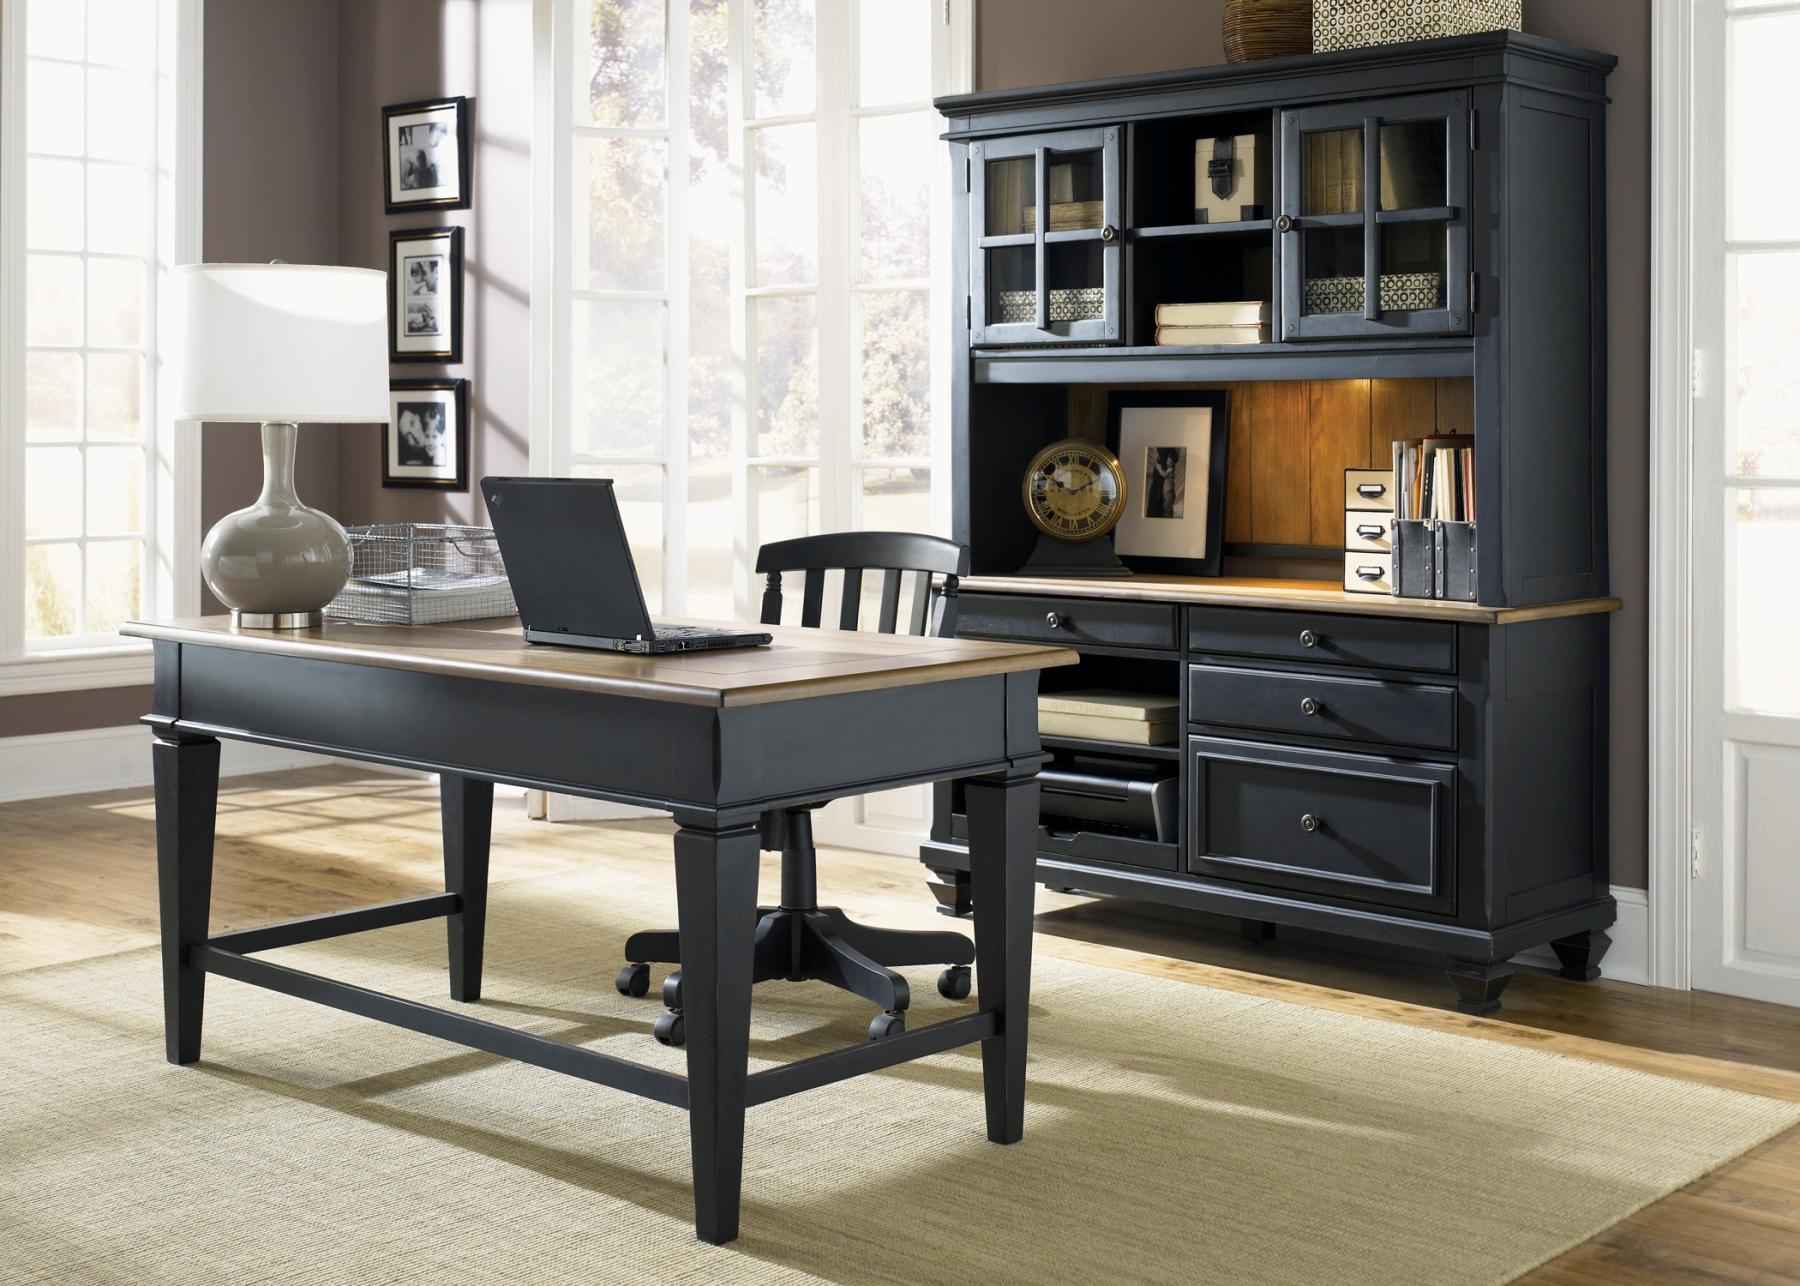 Bungalow II Black Jr Executive Home Office SetMedia Image